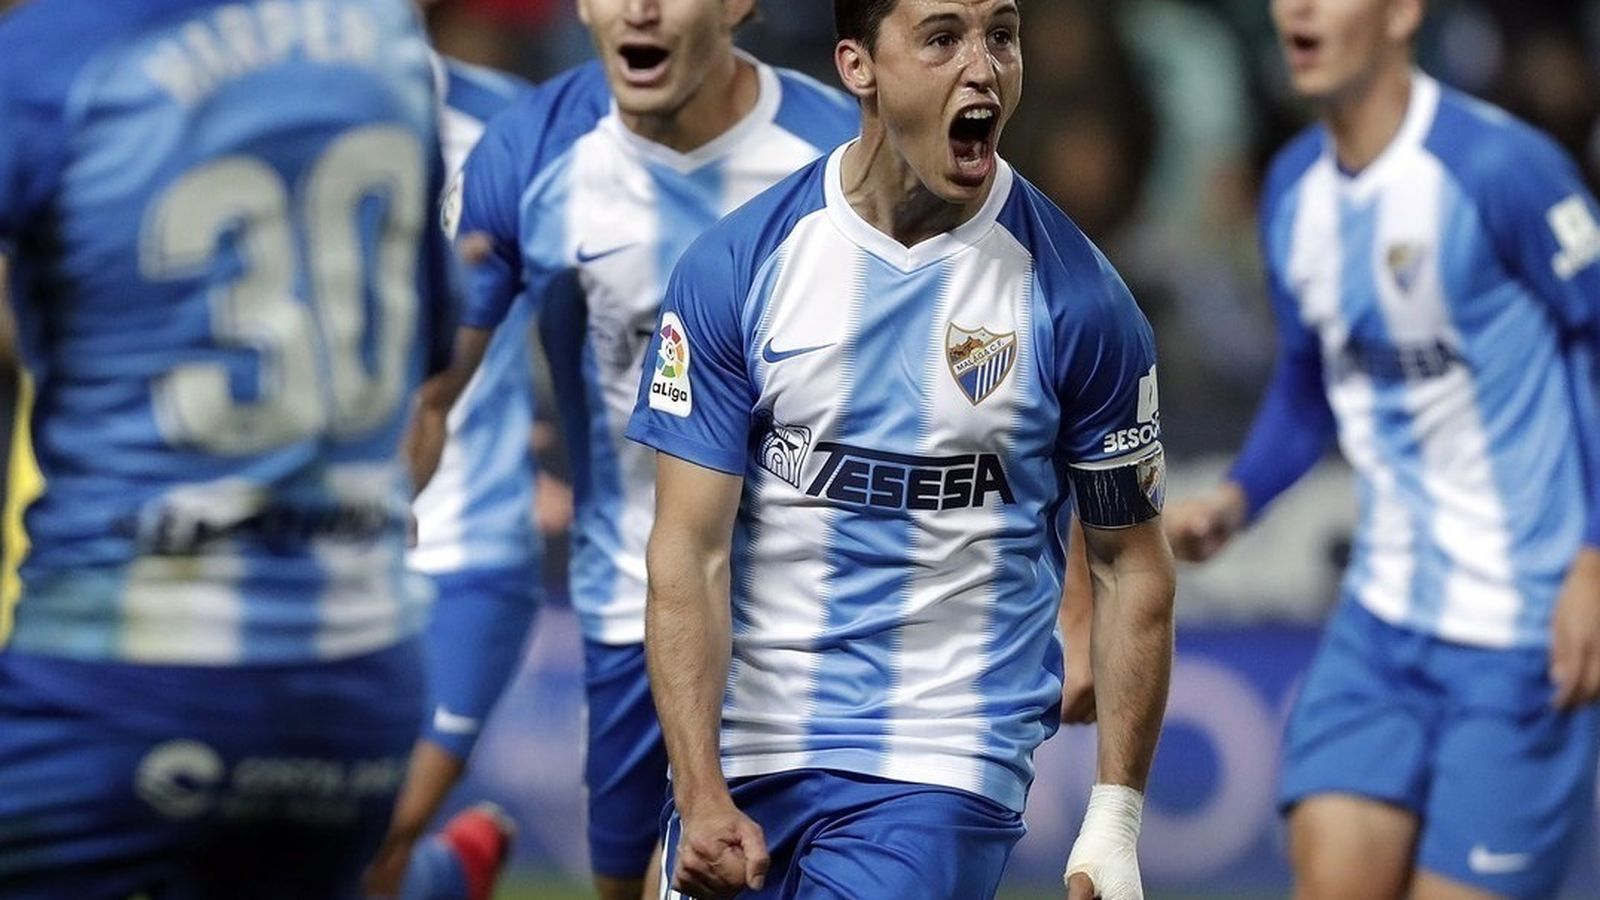 Foto: Jugadores del Málaga celebran un gol. (Europa Press)